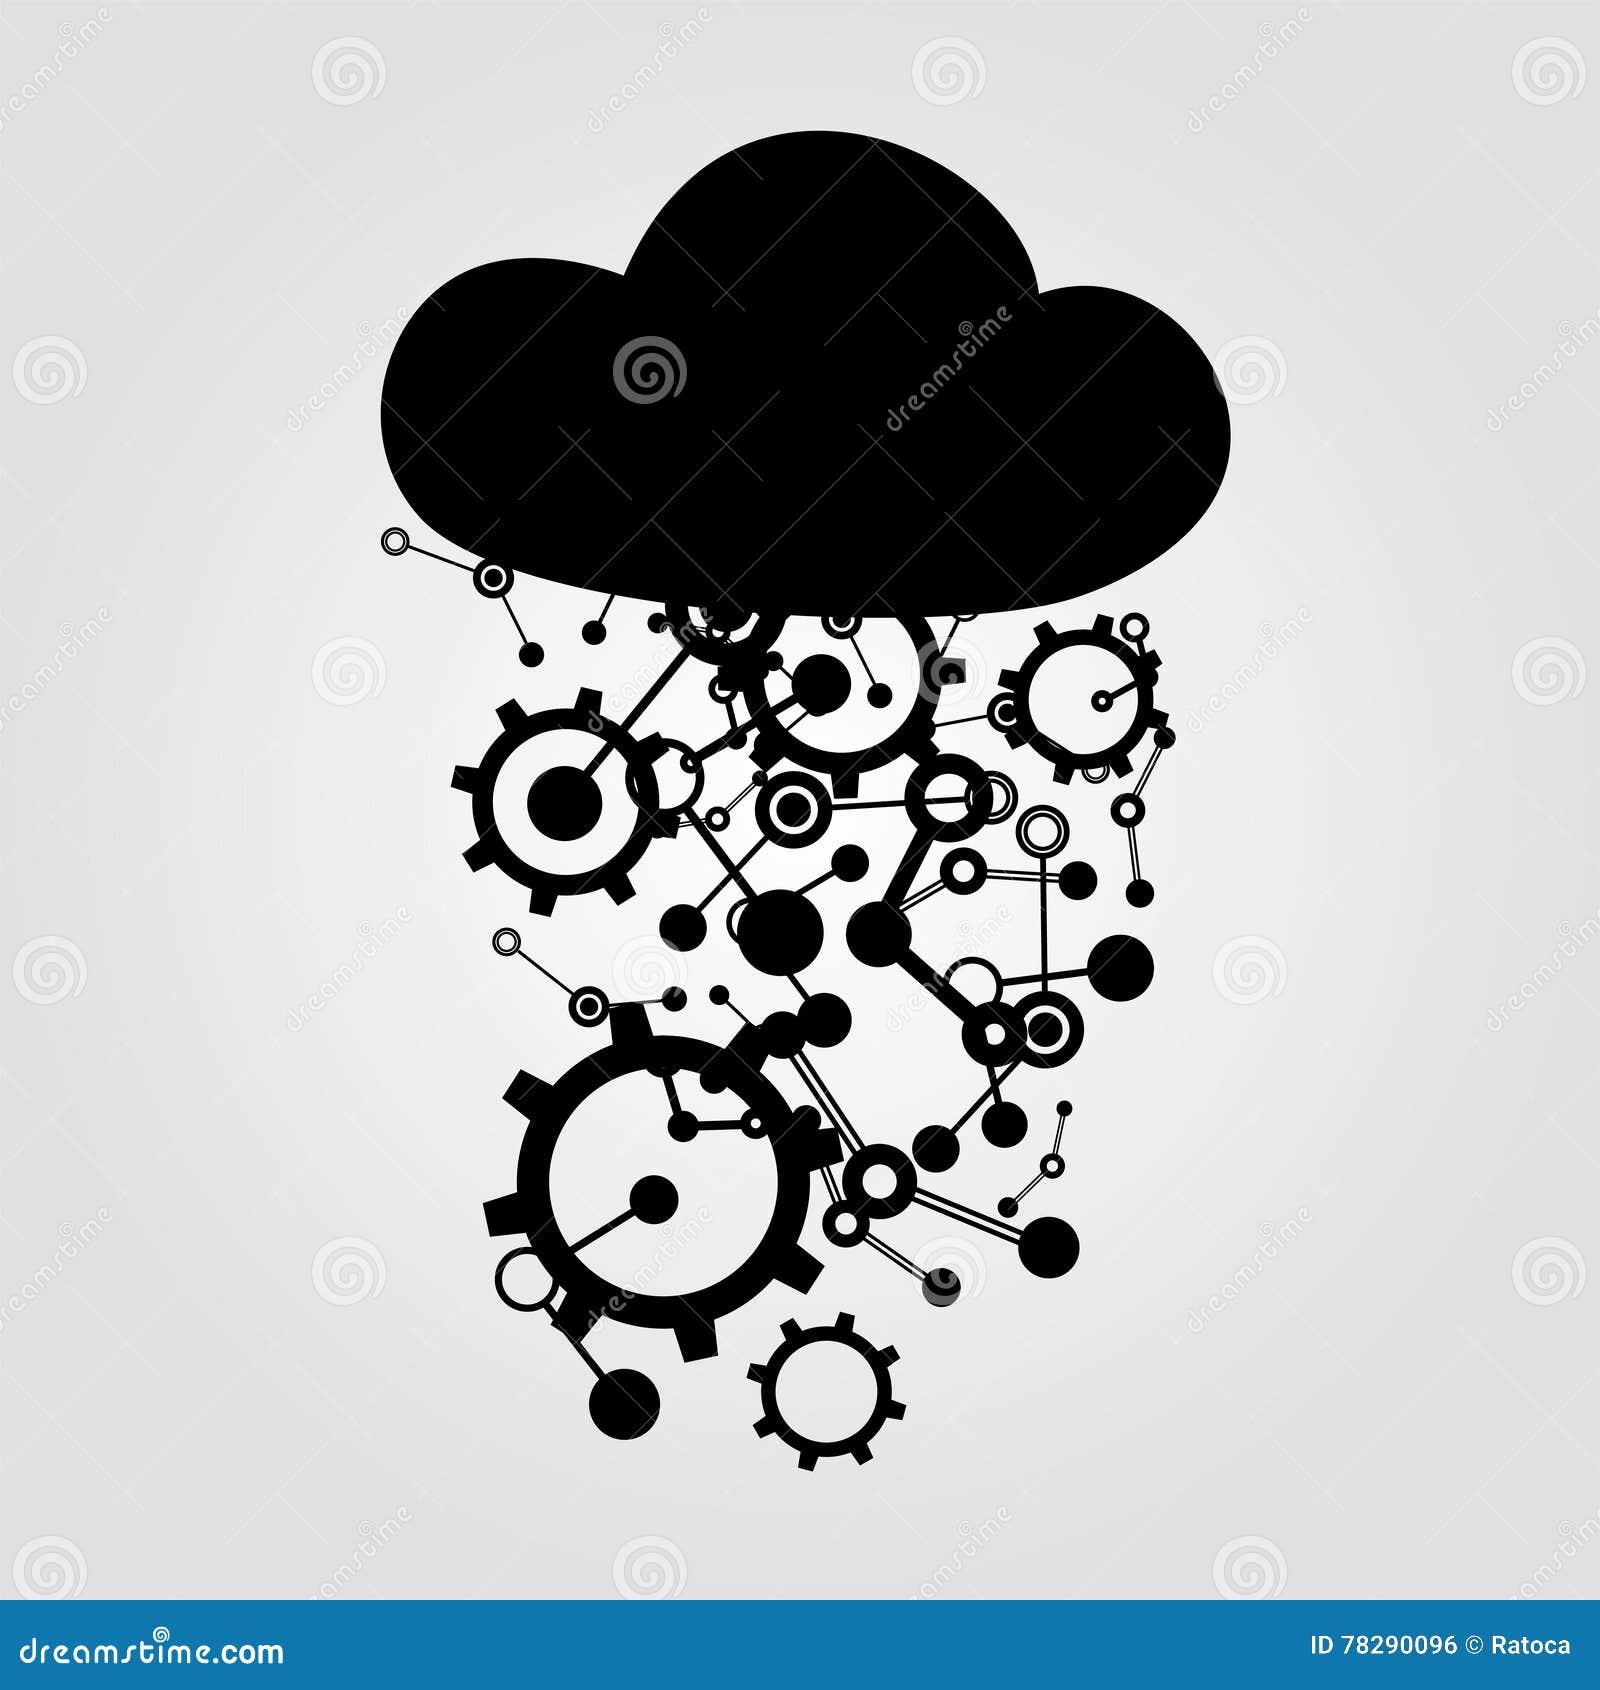 Tech cloud symbol stock vector illustration of tech 78290096 tech cloud symbol industrial configuration biocorpaavc Gallery